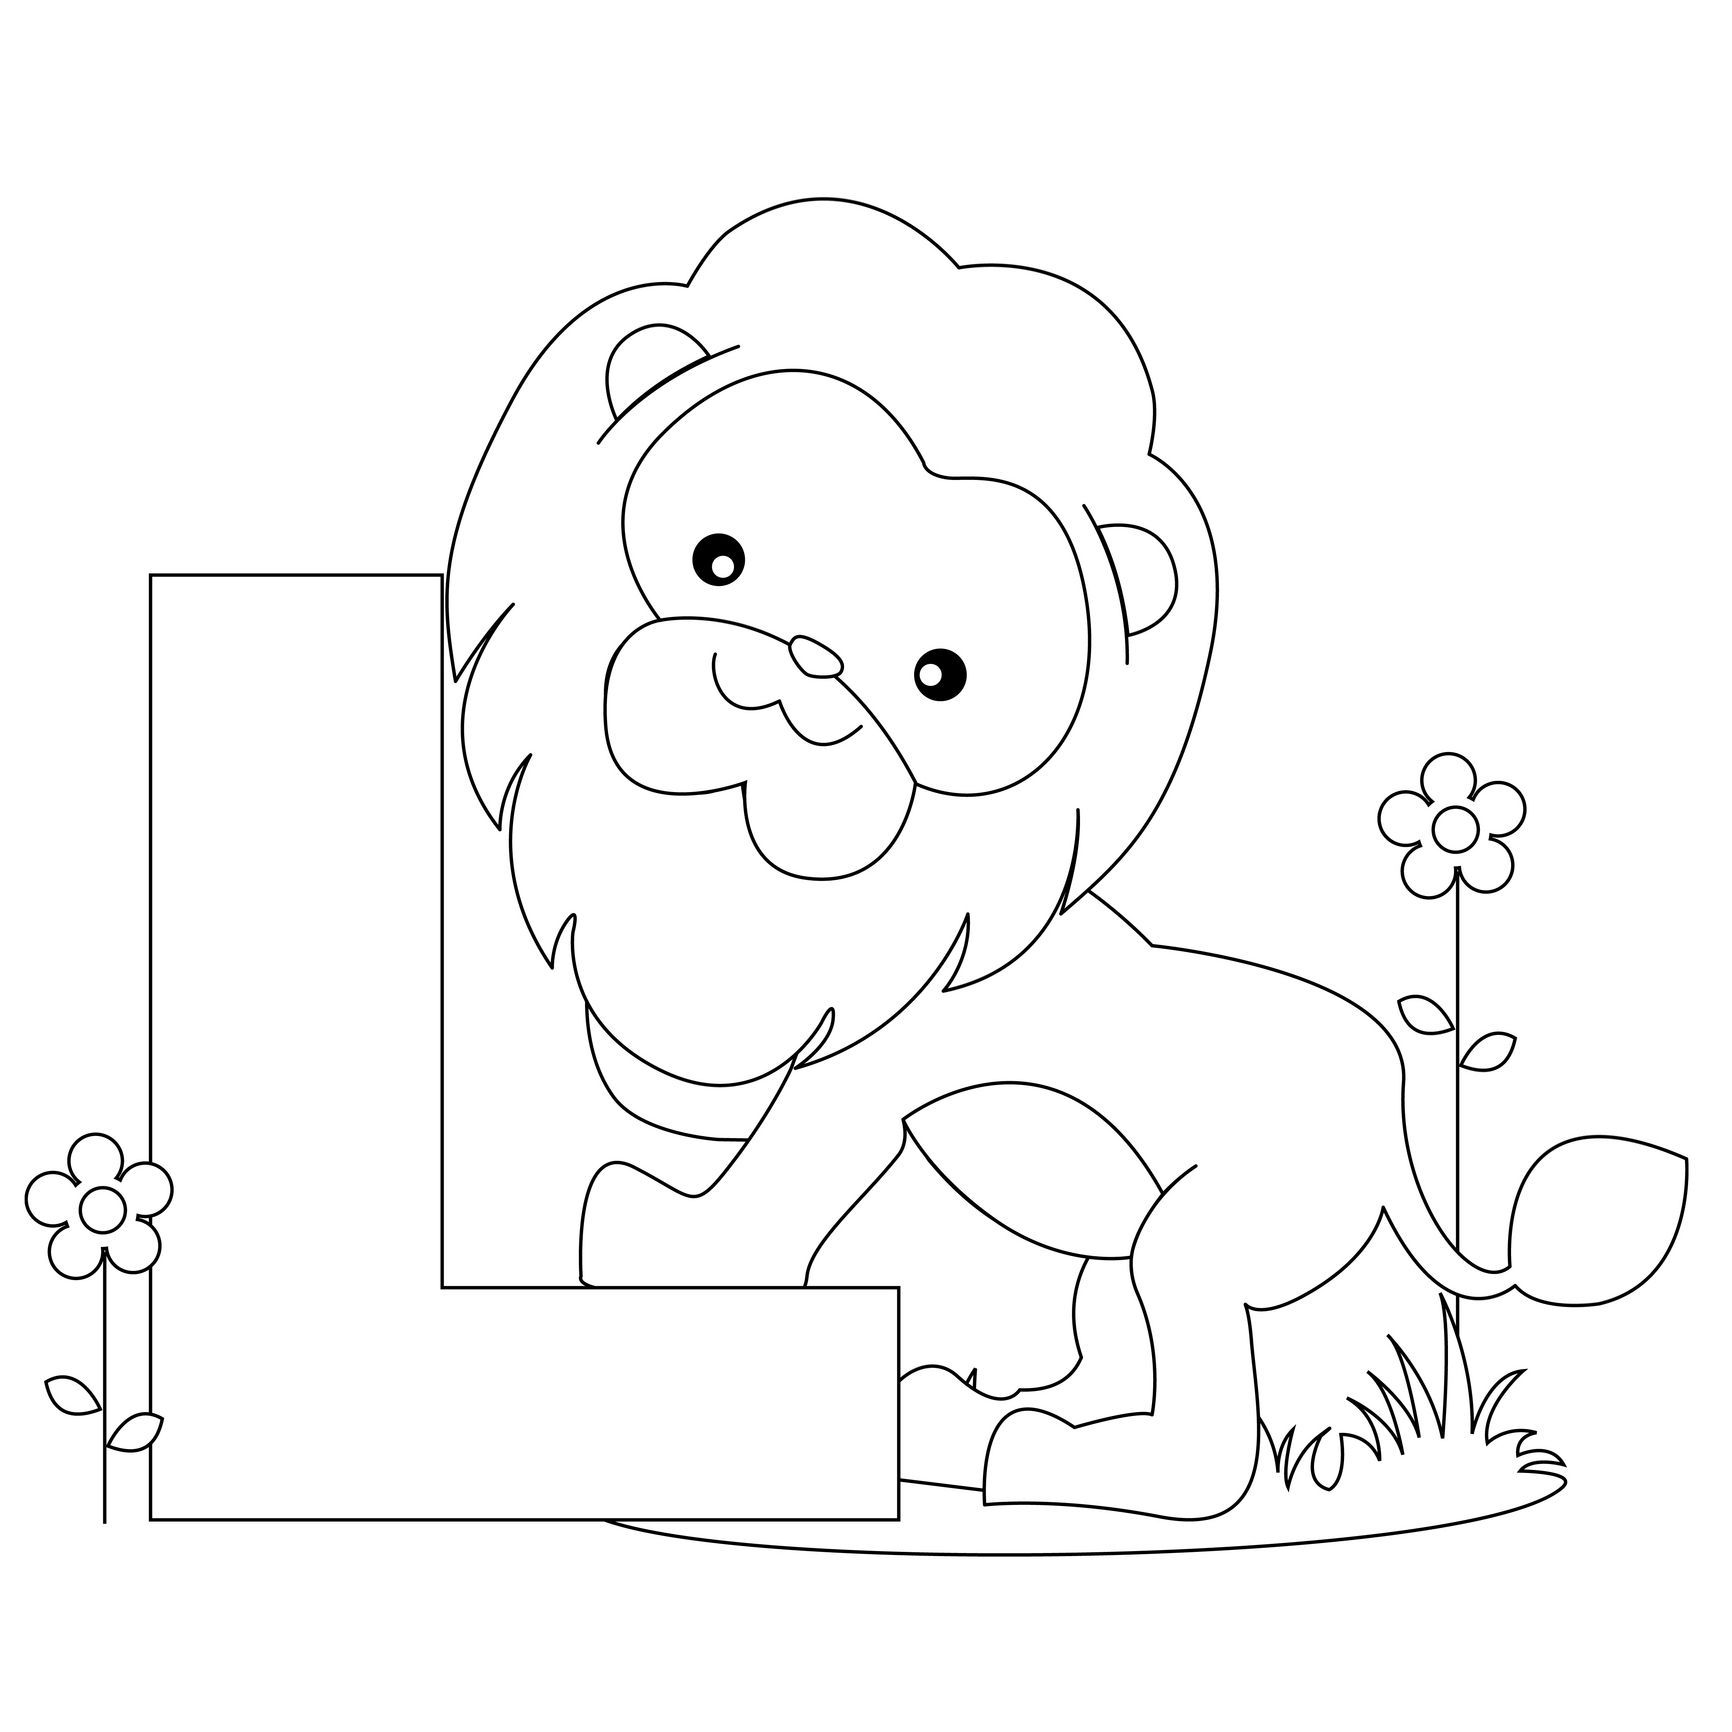 Image Detail For -Animal Alphabet: Letter L Coloring Worksheet And - Free Printable Animal Alphabet Letters